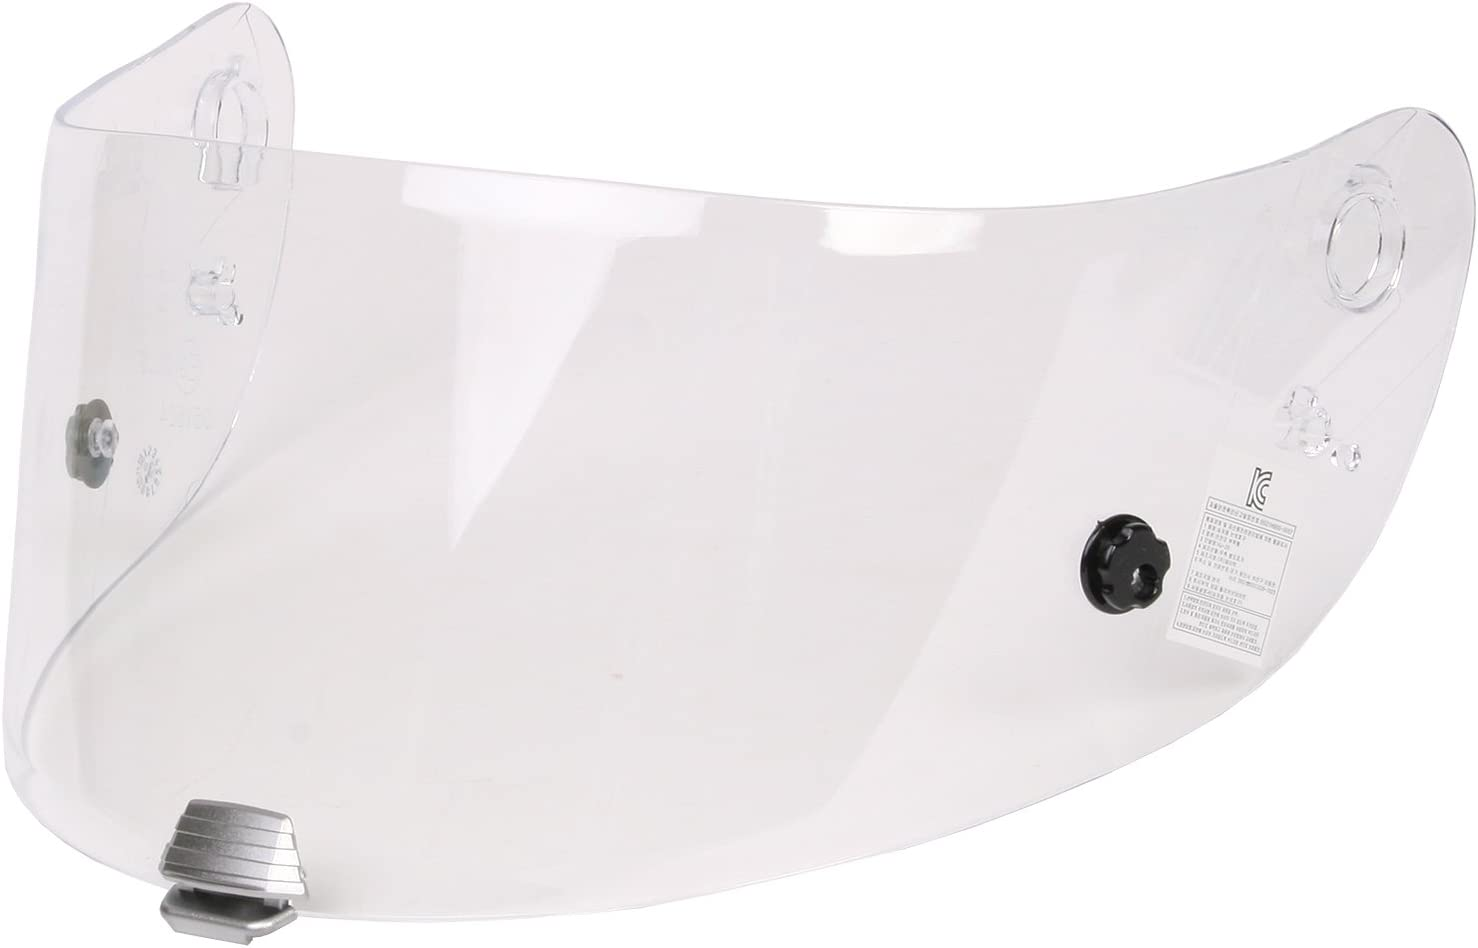 Shield Rpha-10 HJC Helmet Hj-20 visor Clear Rps-10 Pinlock Ready